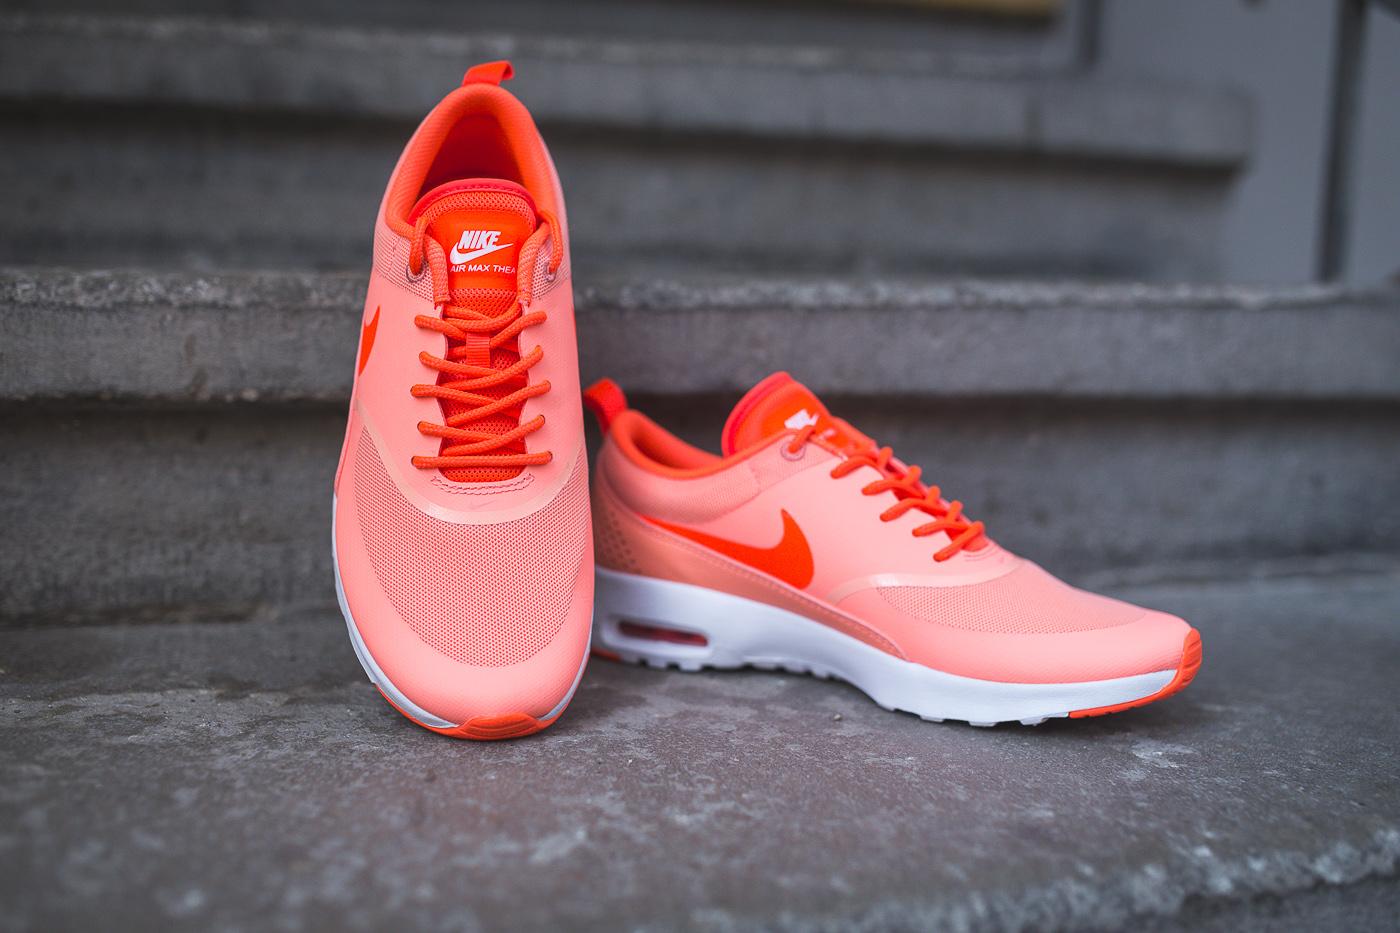 Tenisky pro princezny - Nike Air Max Thea 👑